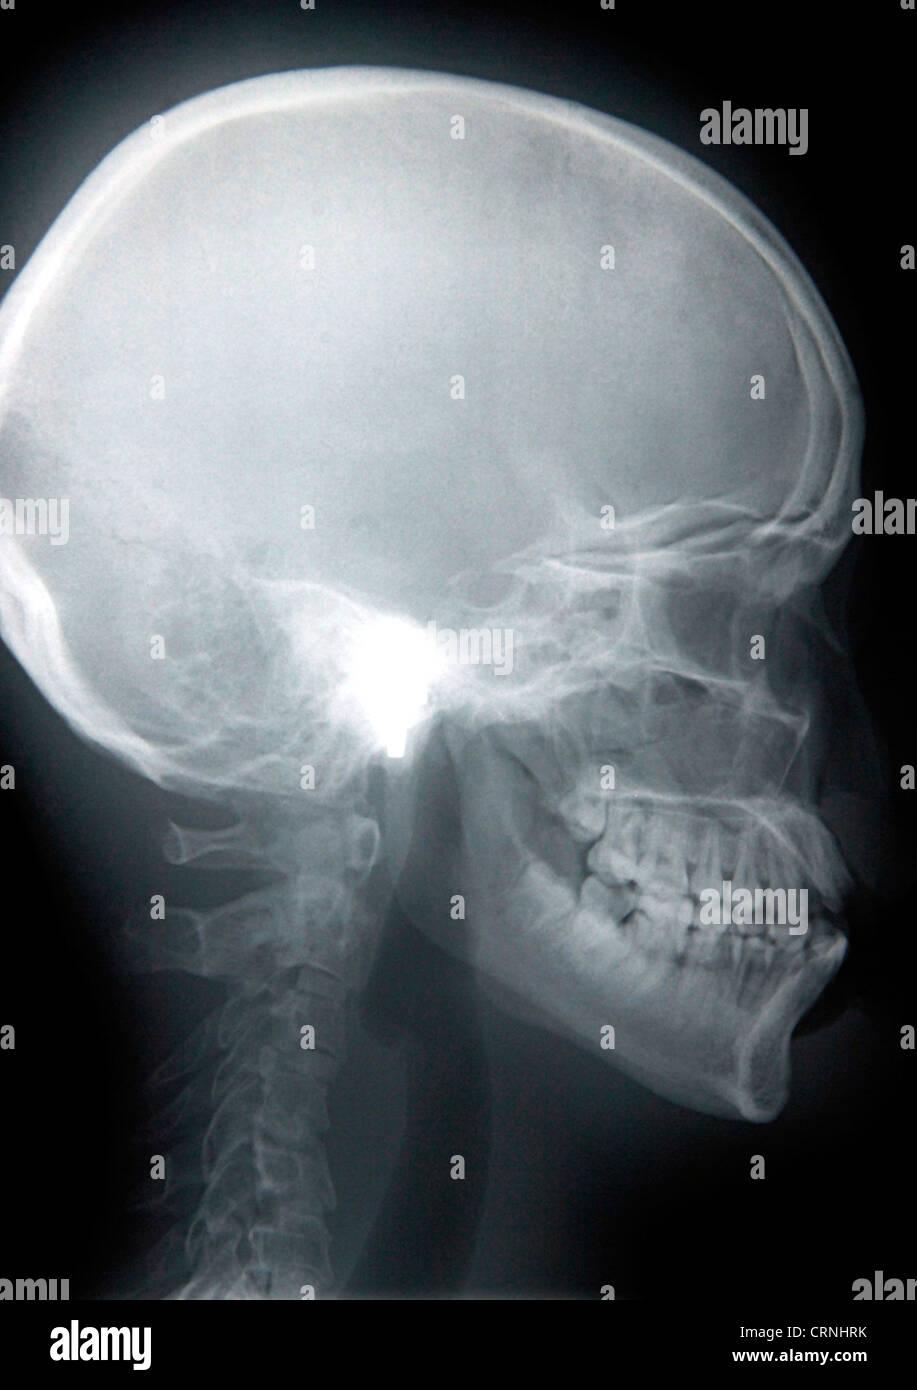 X-ray of a human skull. - Stock Image